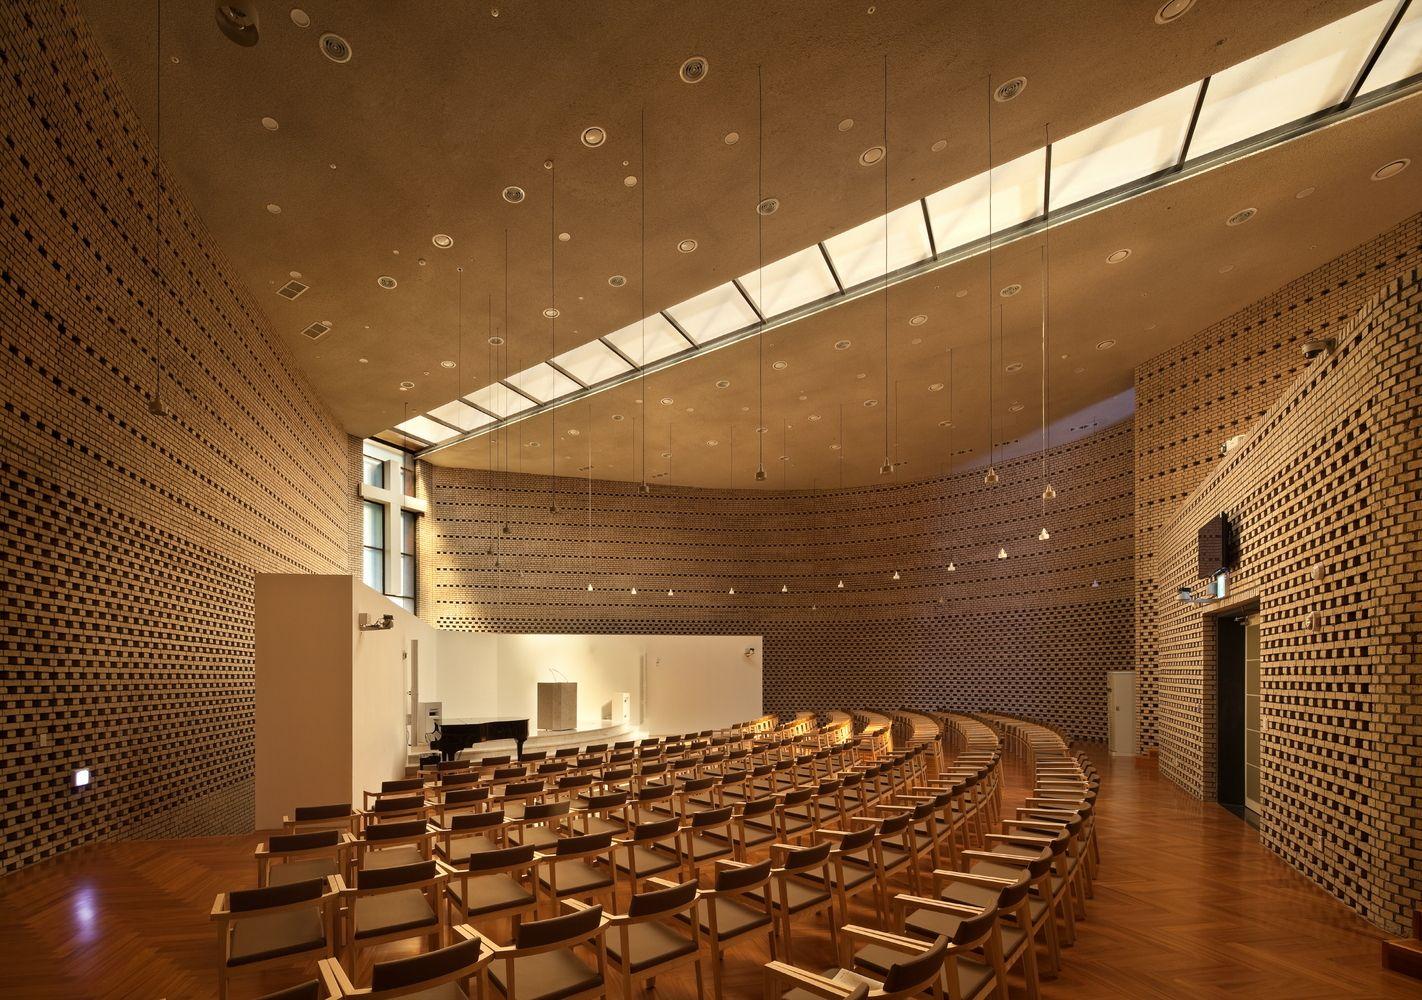 Gallery Of Bufs Chapel Architects Group Raum Nikken Sekkei 9  # Muebles Alvarez Goian